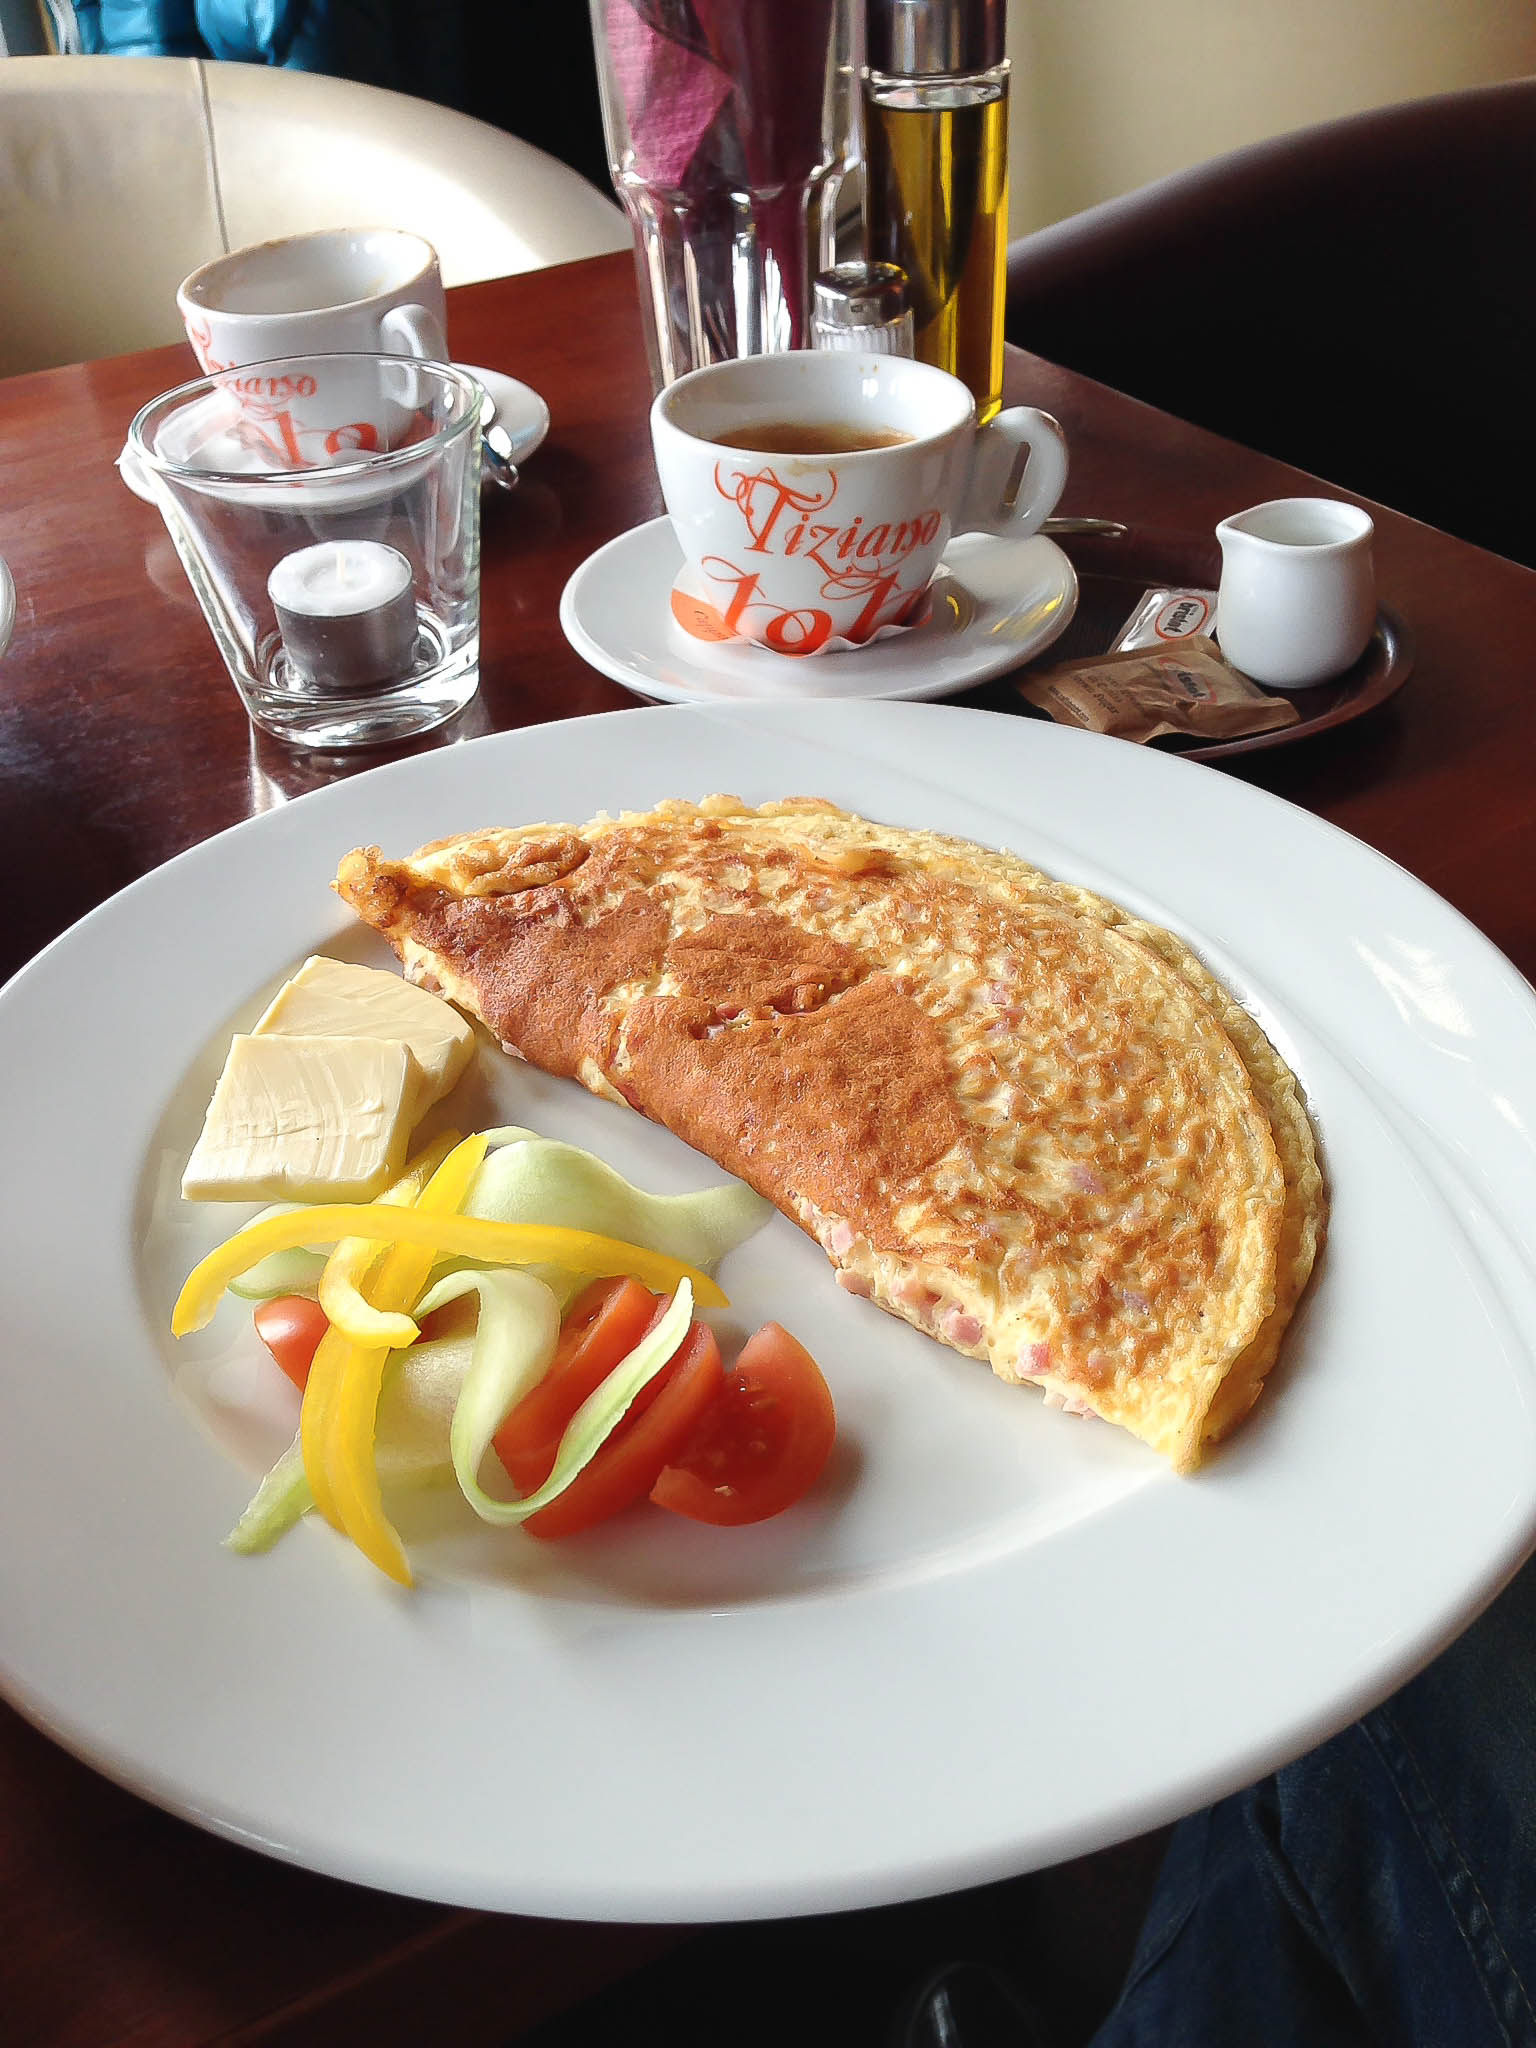 Tie raňajky stoja za hriech.